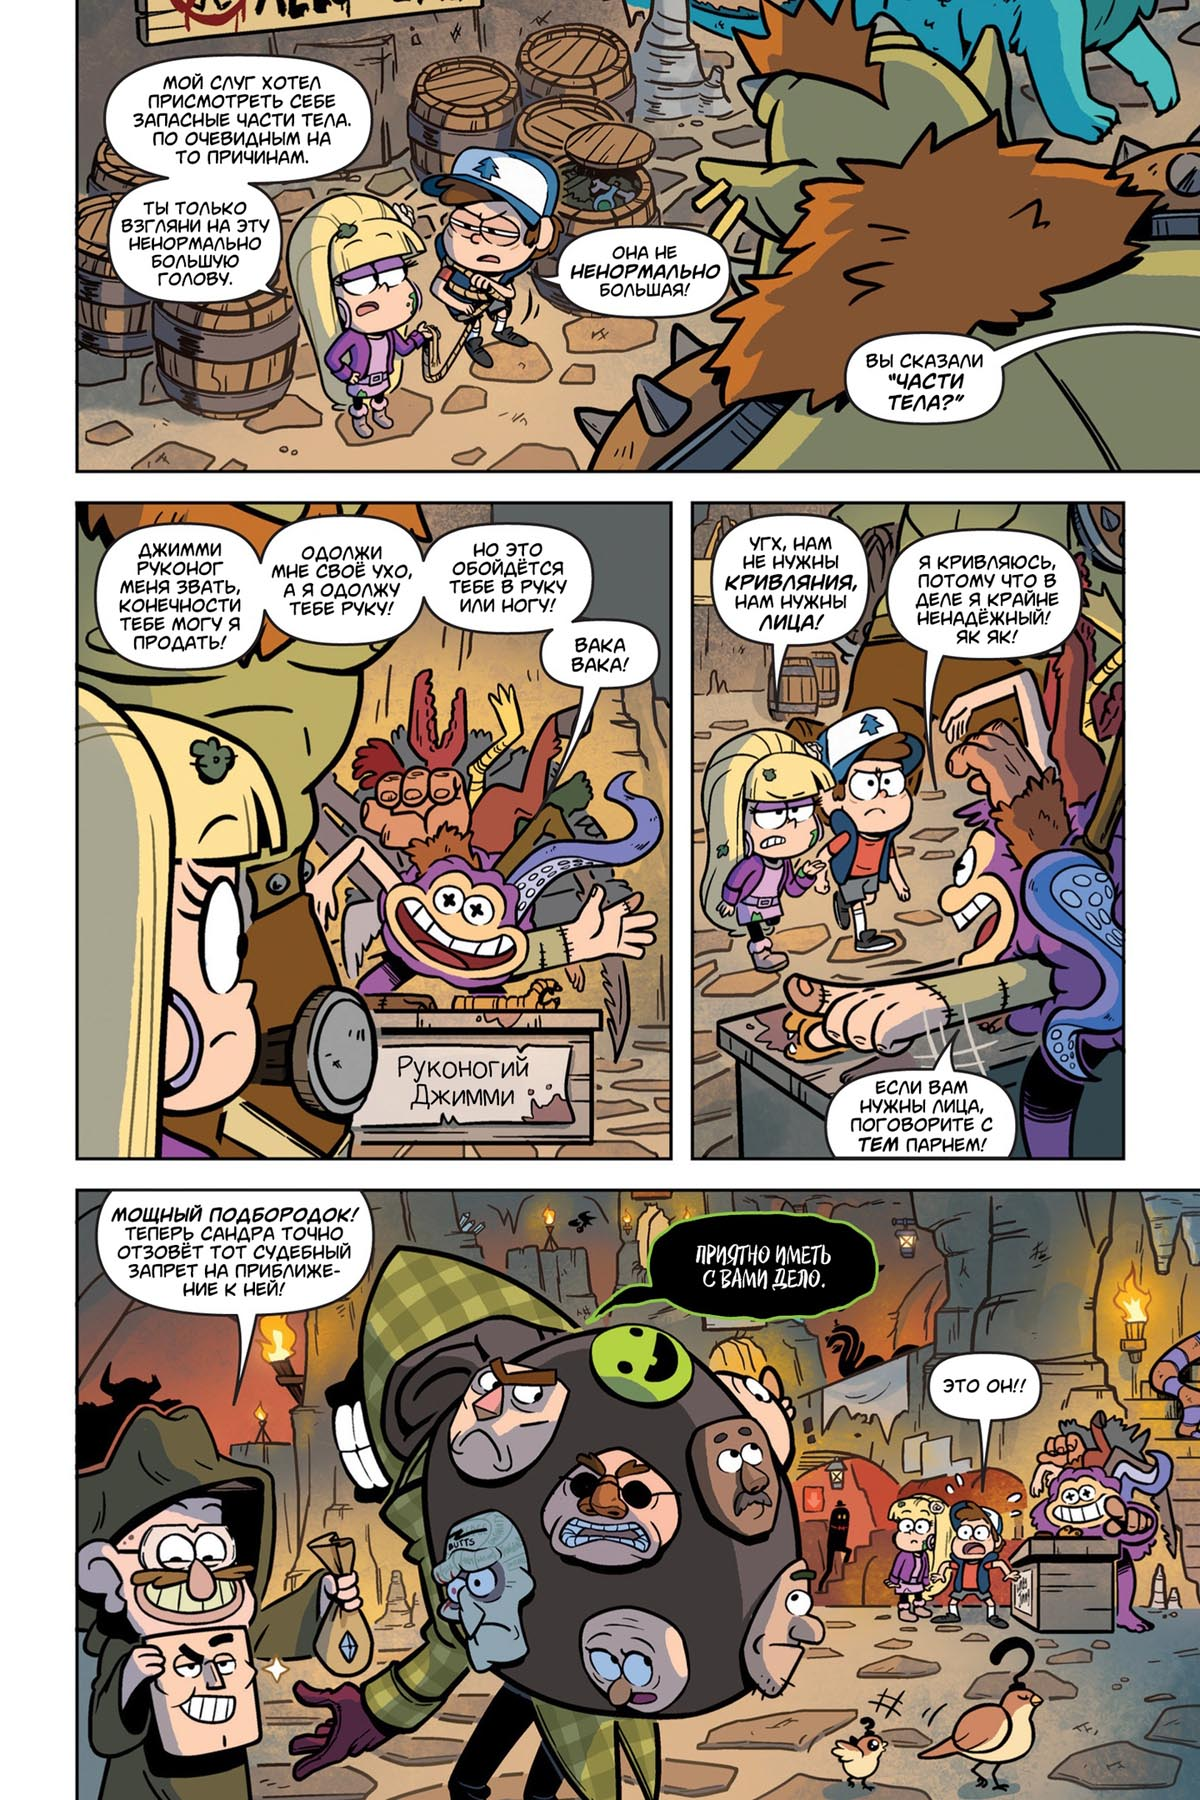 Комикс Гравити Фолз Утерянные Легенды 4-5